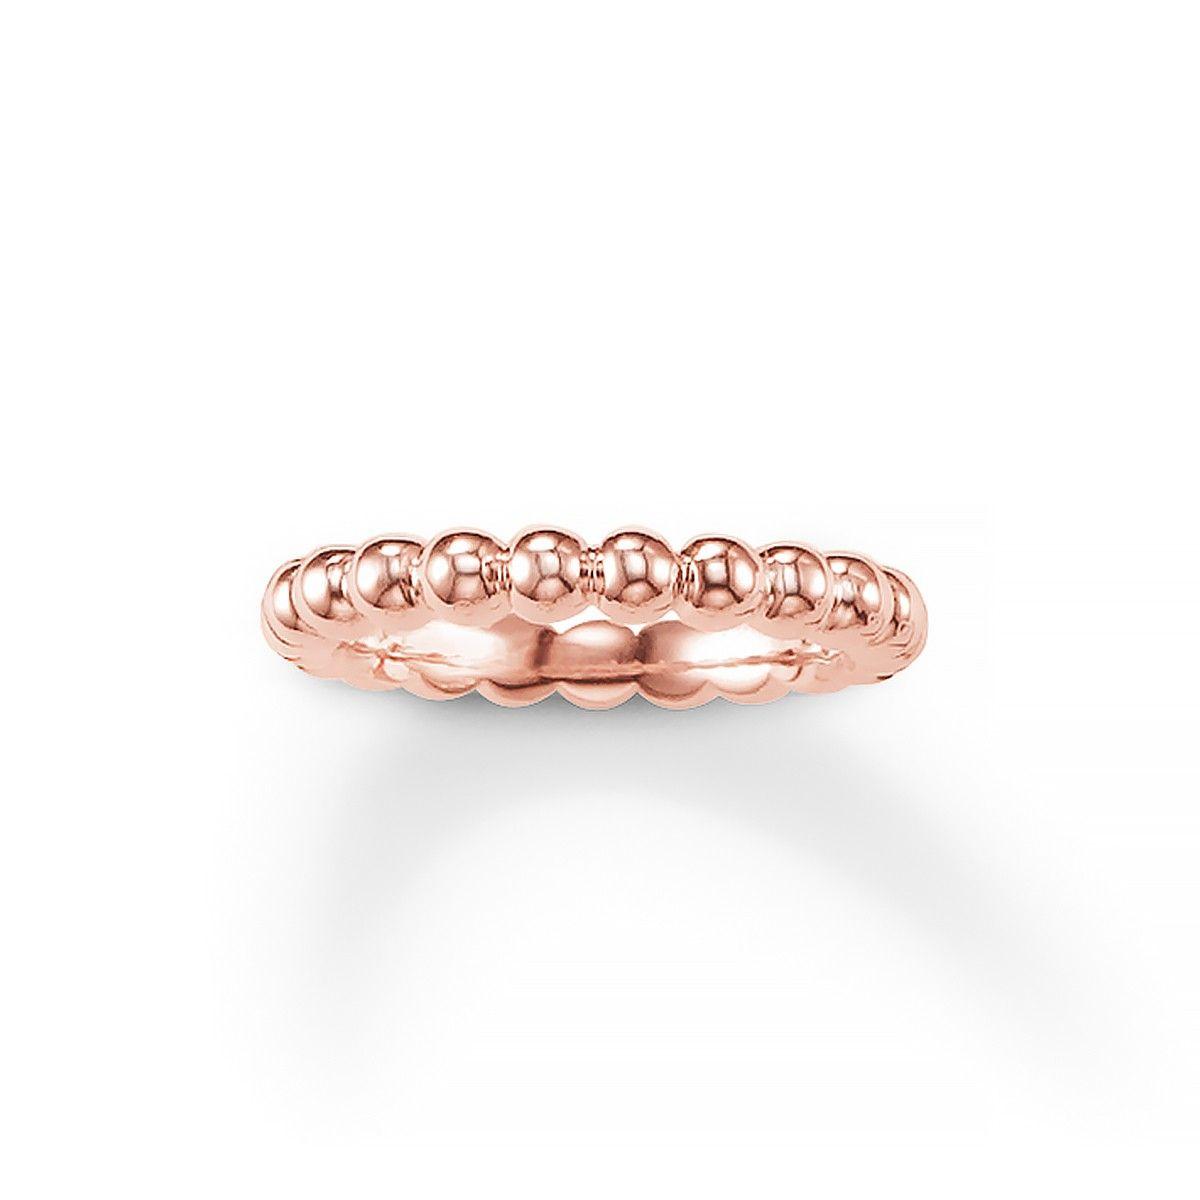 Thomas Sabo Thomas Sabo Designers Rose Gold Plated Ring Beaded Rings Rose Gold